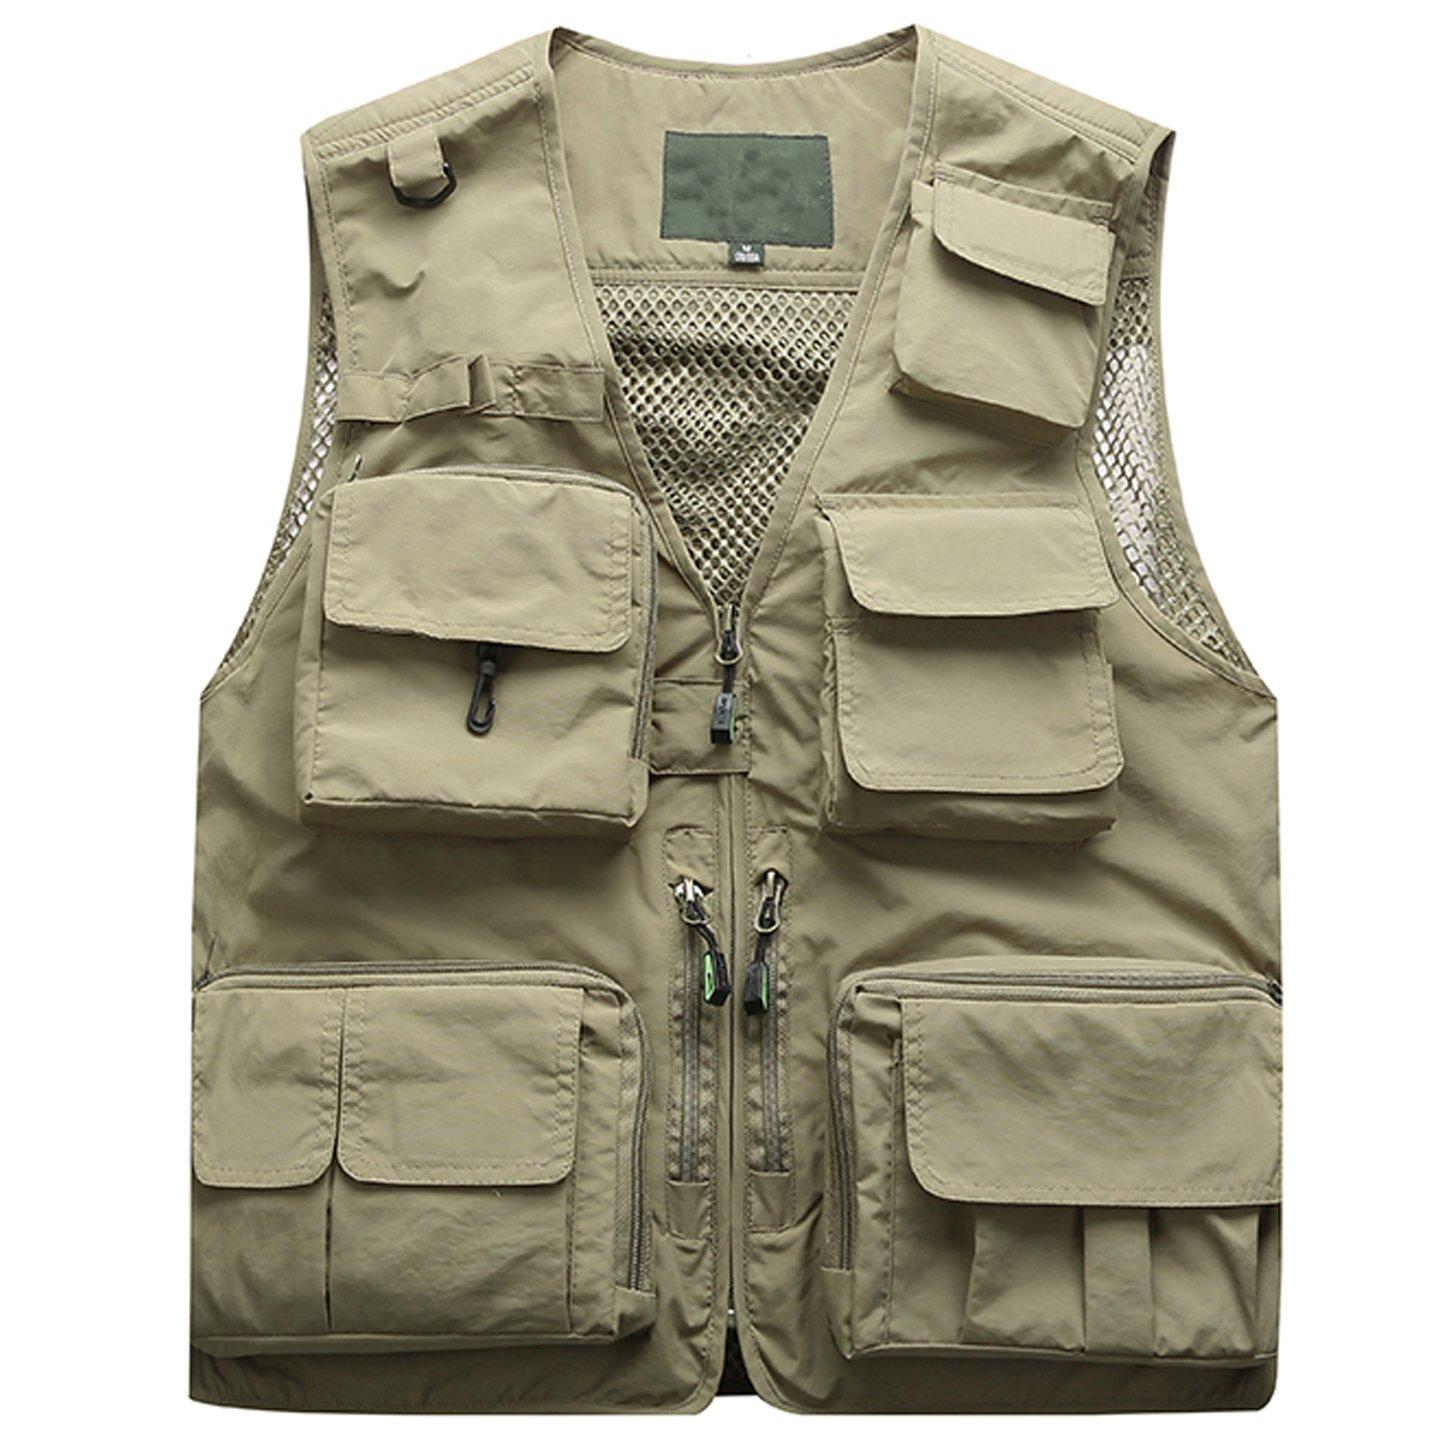 Flygo Men's Multi-Pocket Outdoor Quick Dry Mesh Fishing Safari Photo Vest Waistcoat Jackets